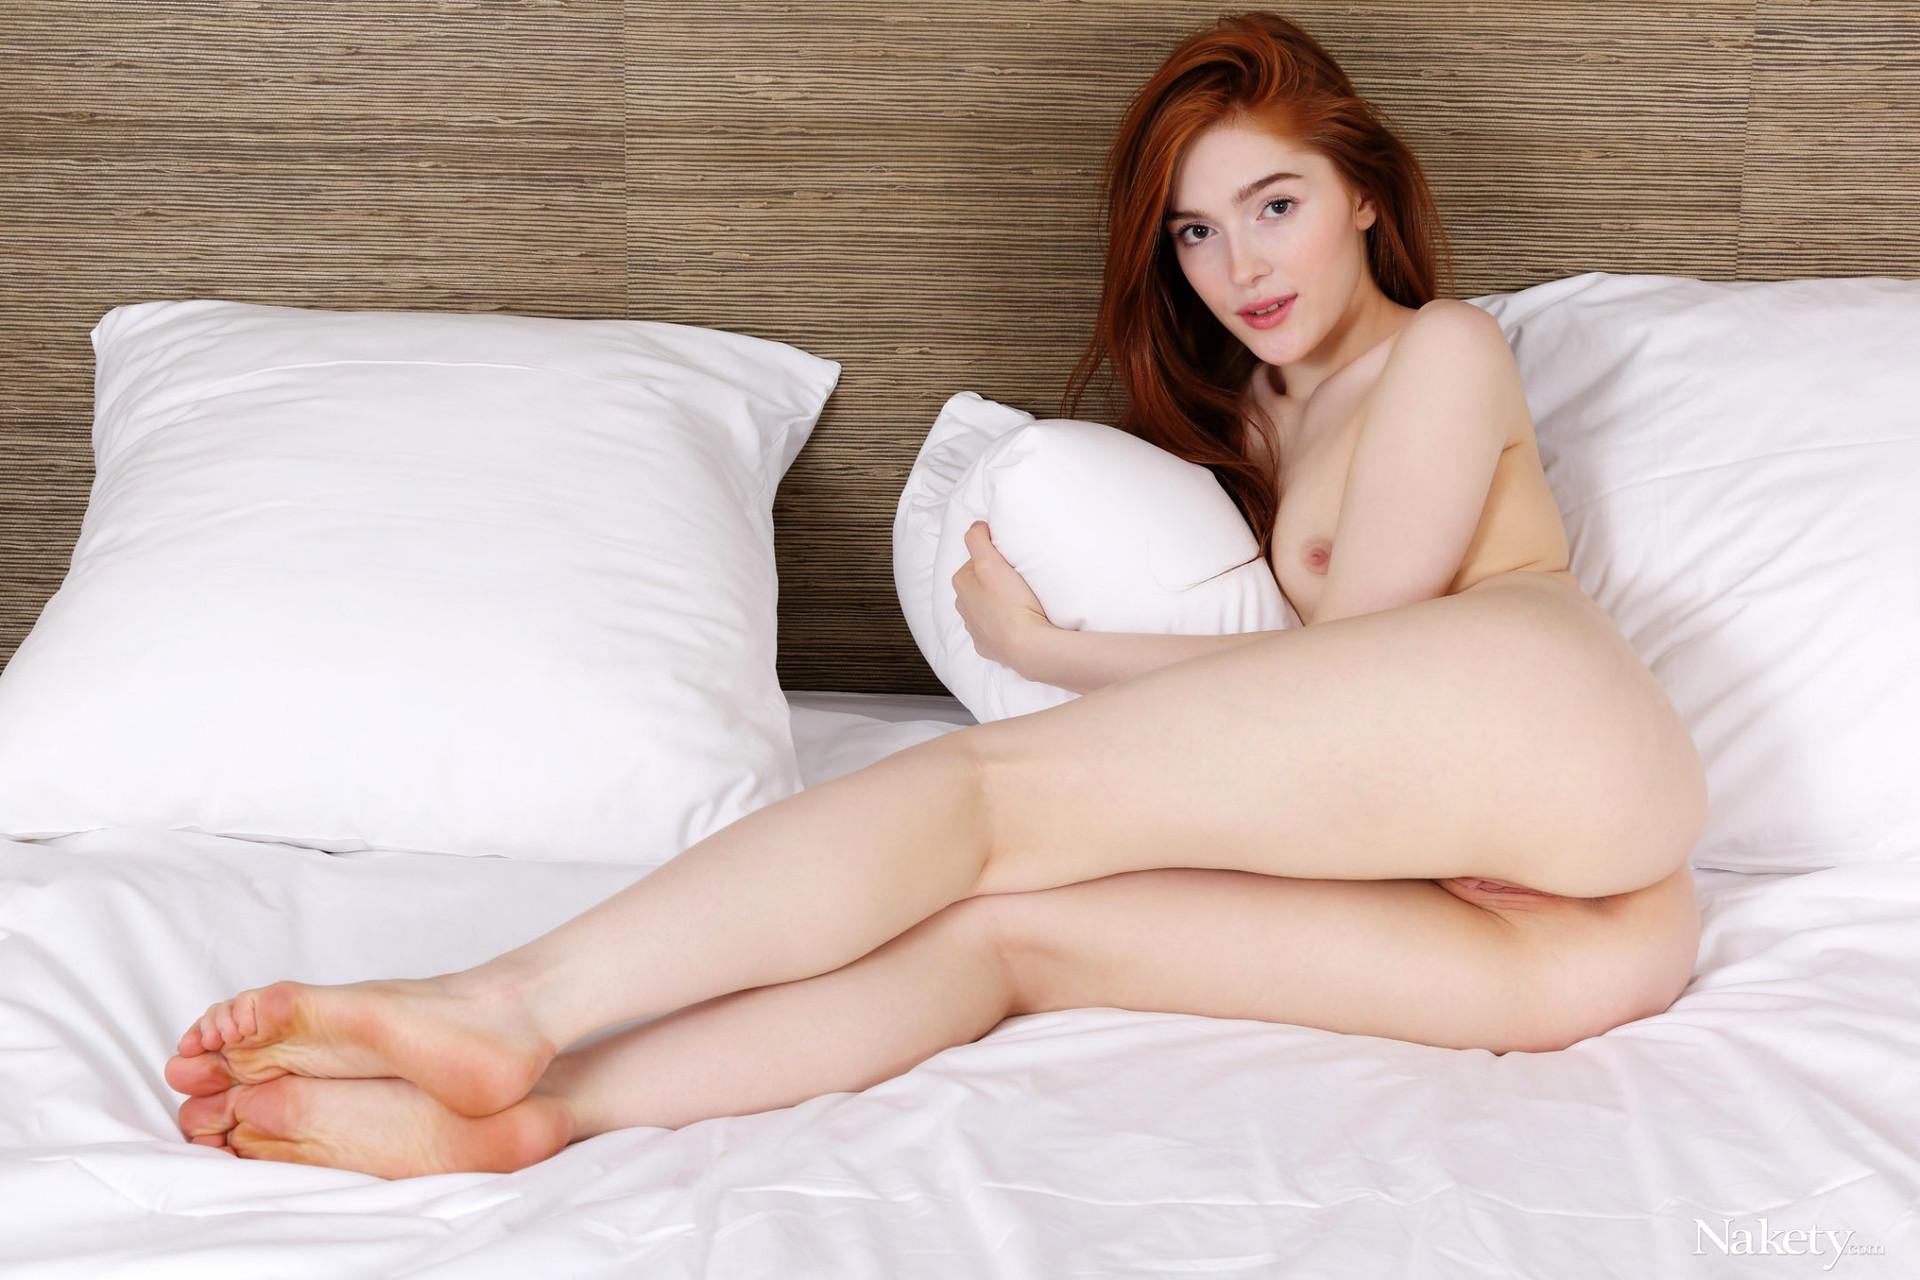 Sex Hd Mobile Pics Nakety Jia Lissa New Redhead Maturetubesex-6570